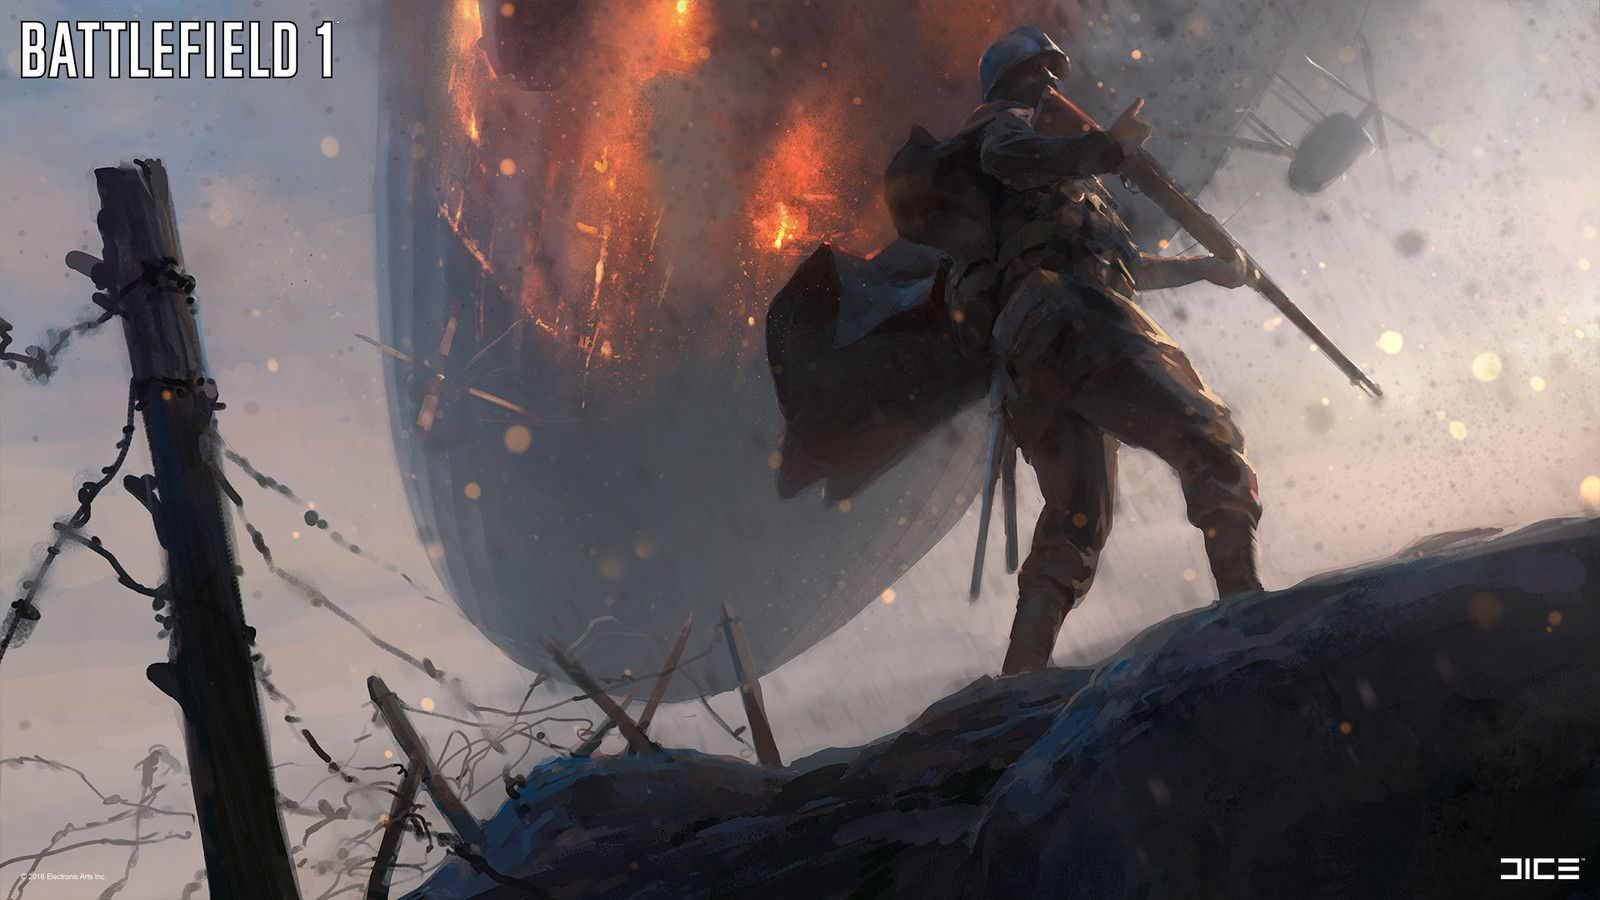 Battlefield 1 Concept Art Robert Sammelin On Artstation At